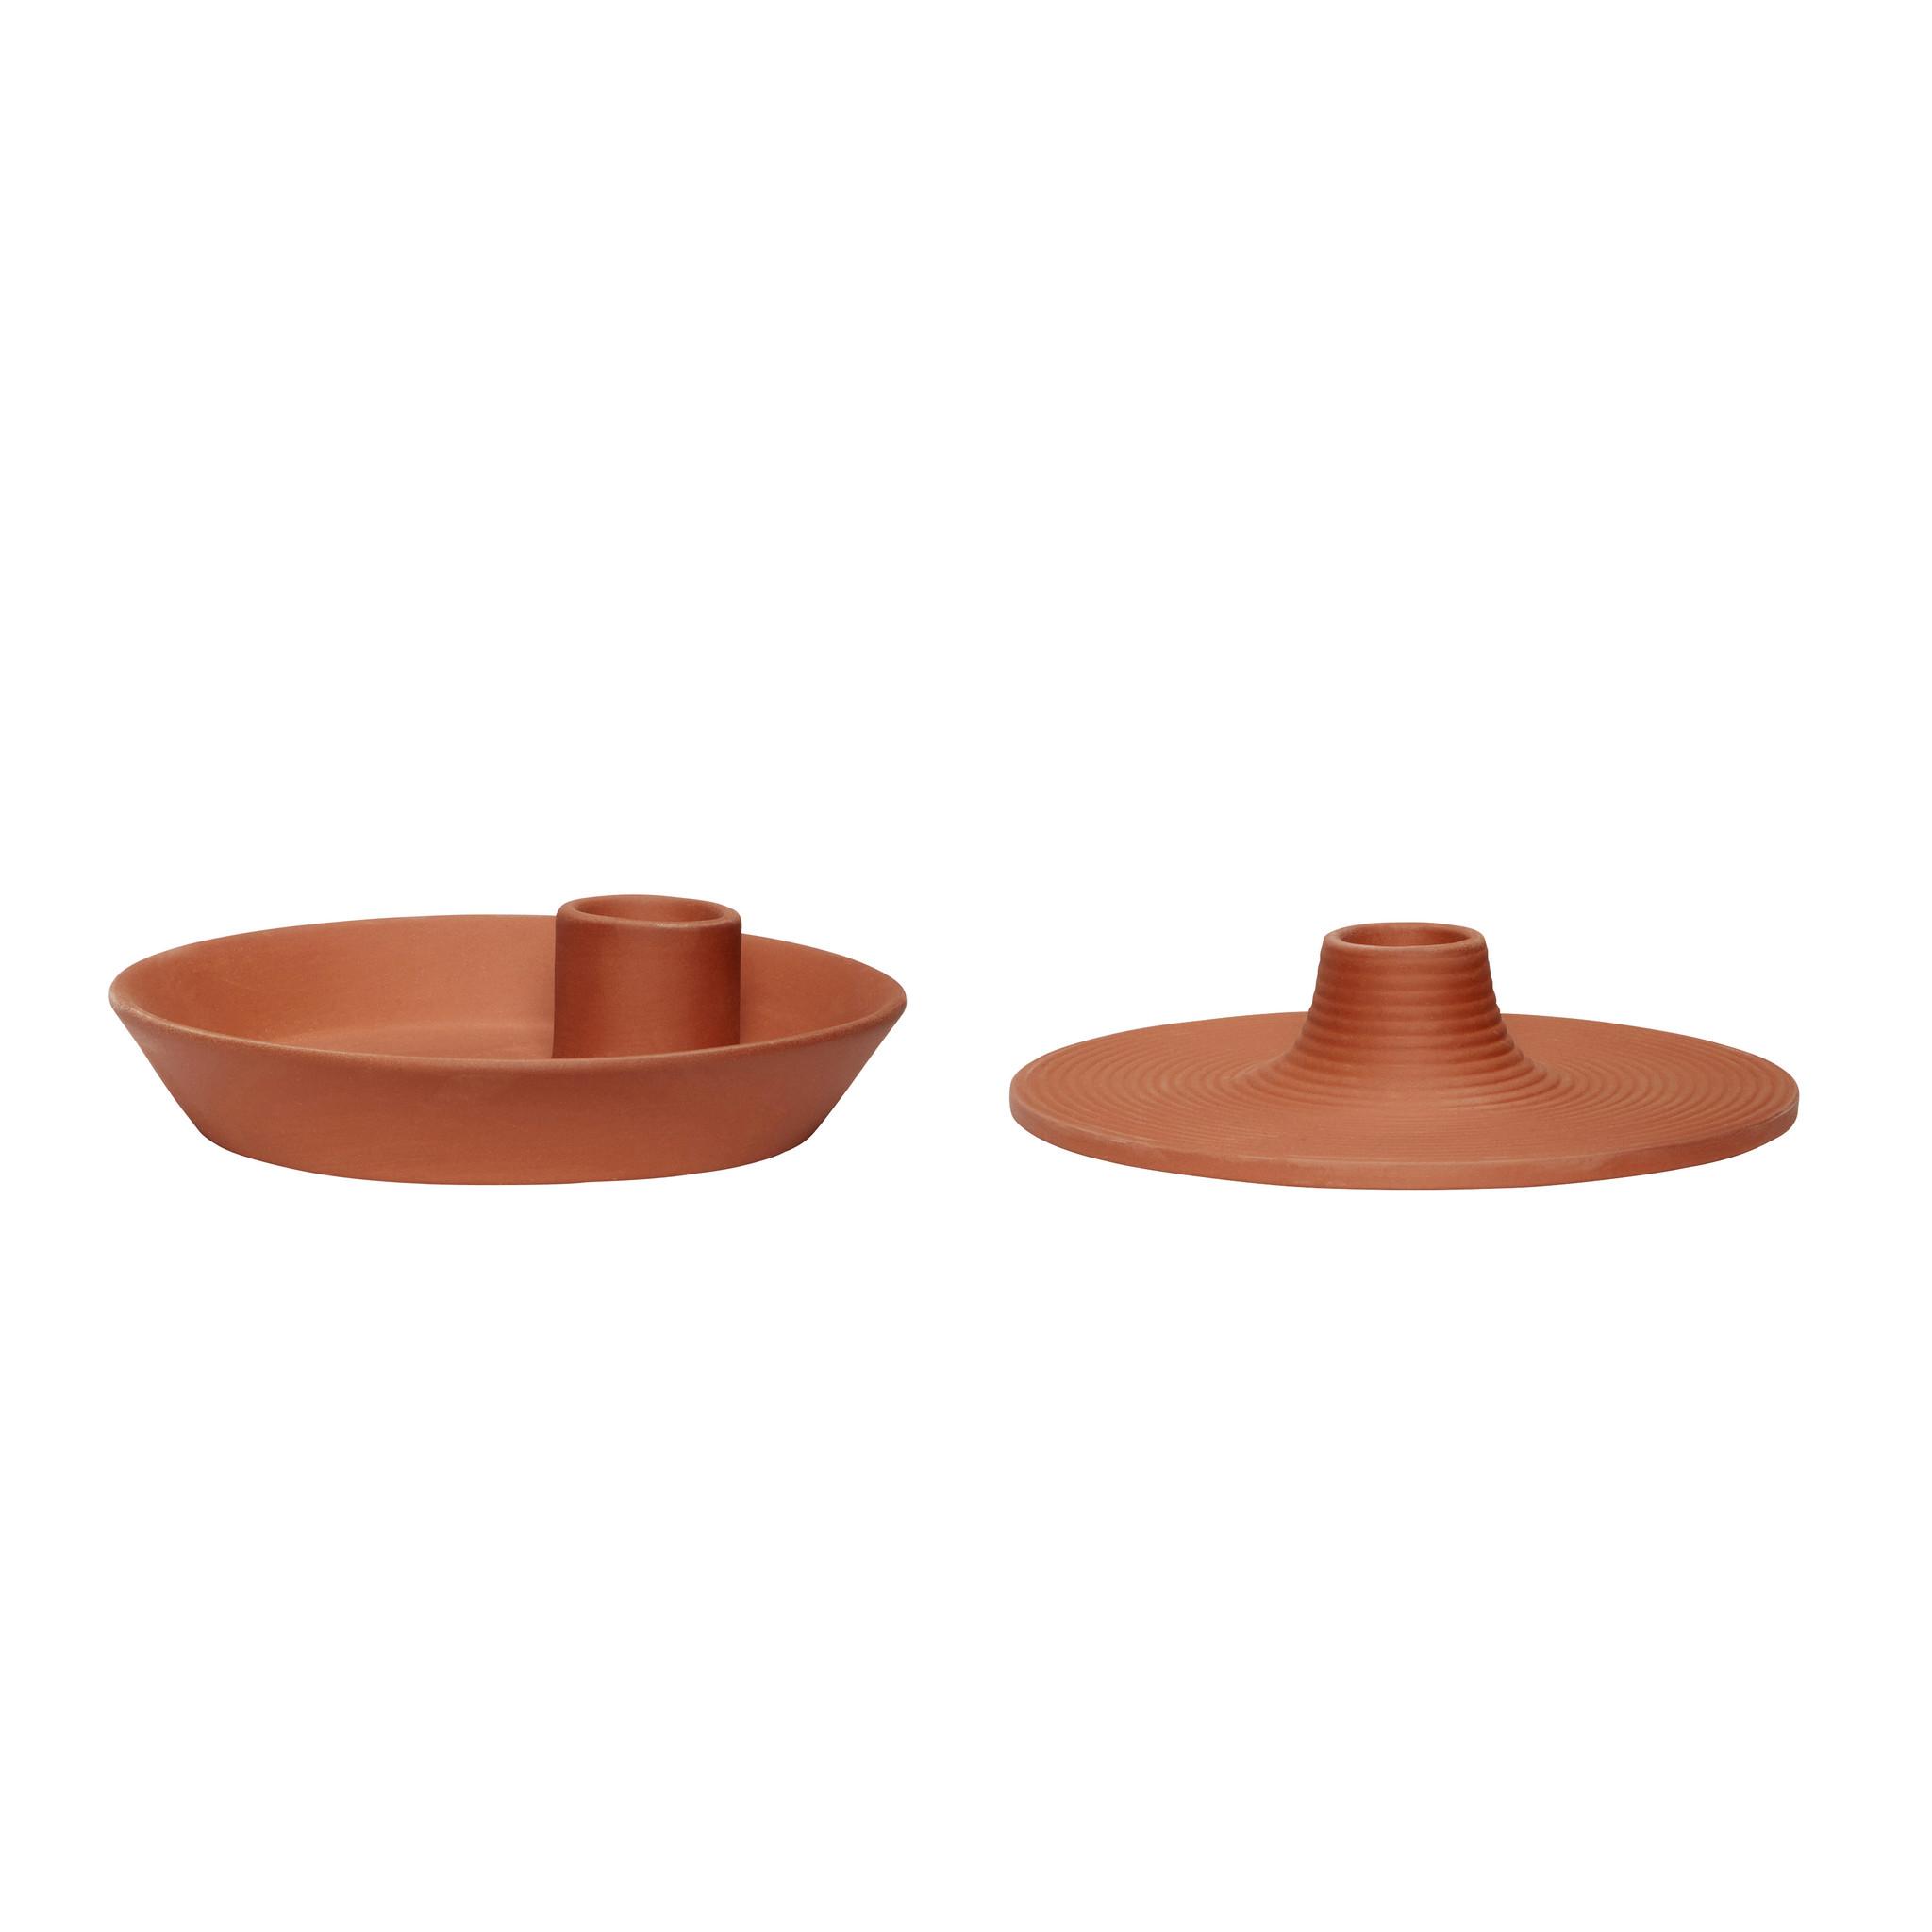 Hubsch Kandelaar, porselein, terracotta, set van 2-640922-5712772071403